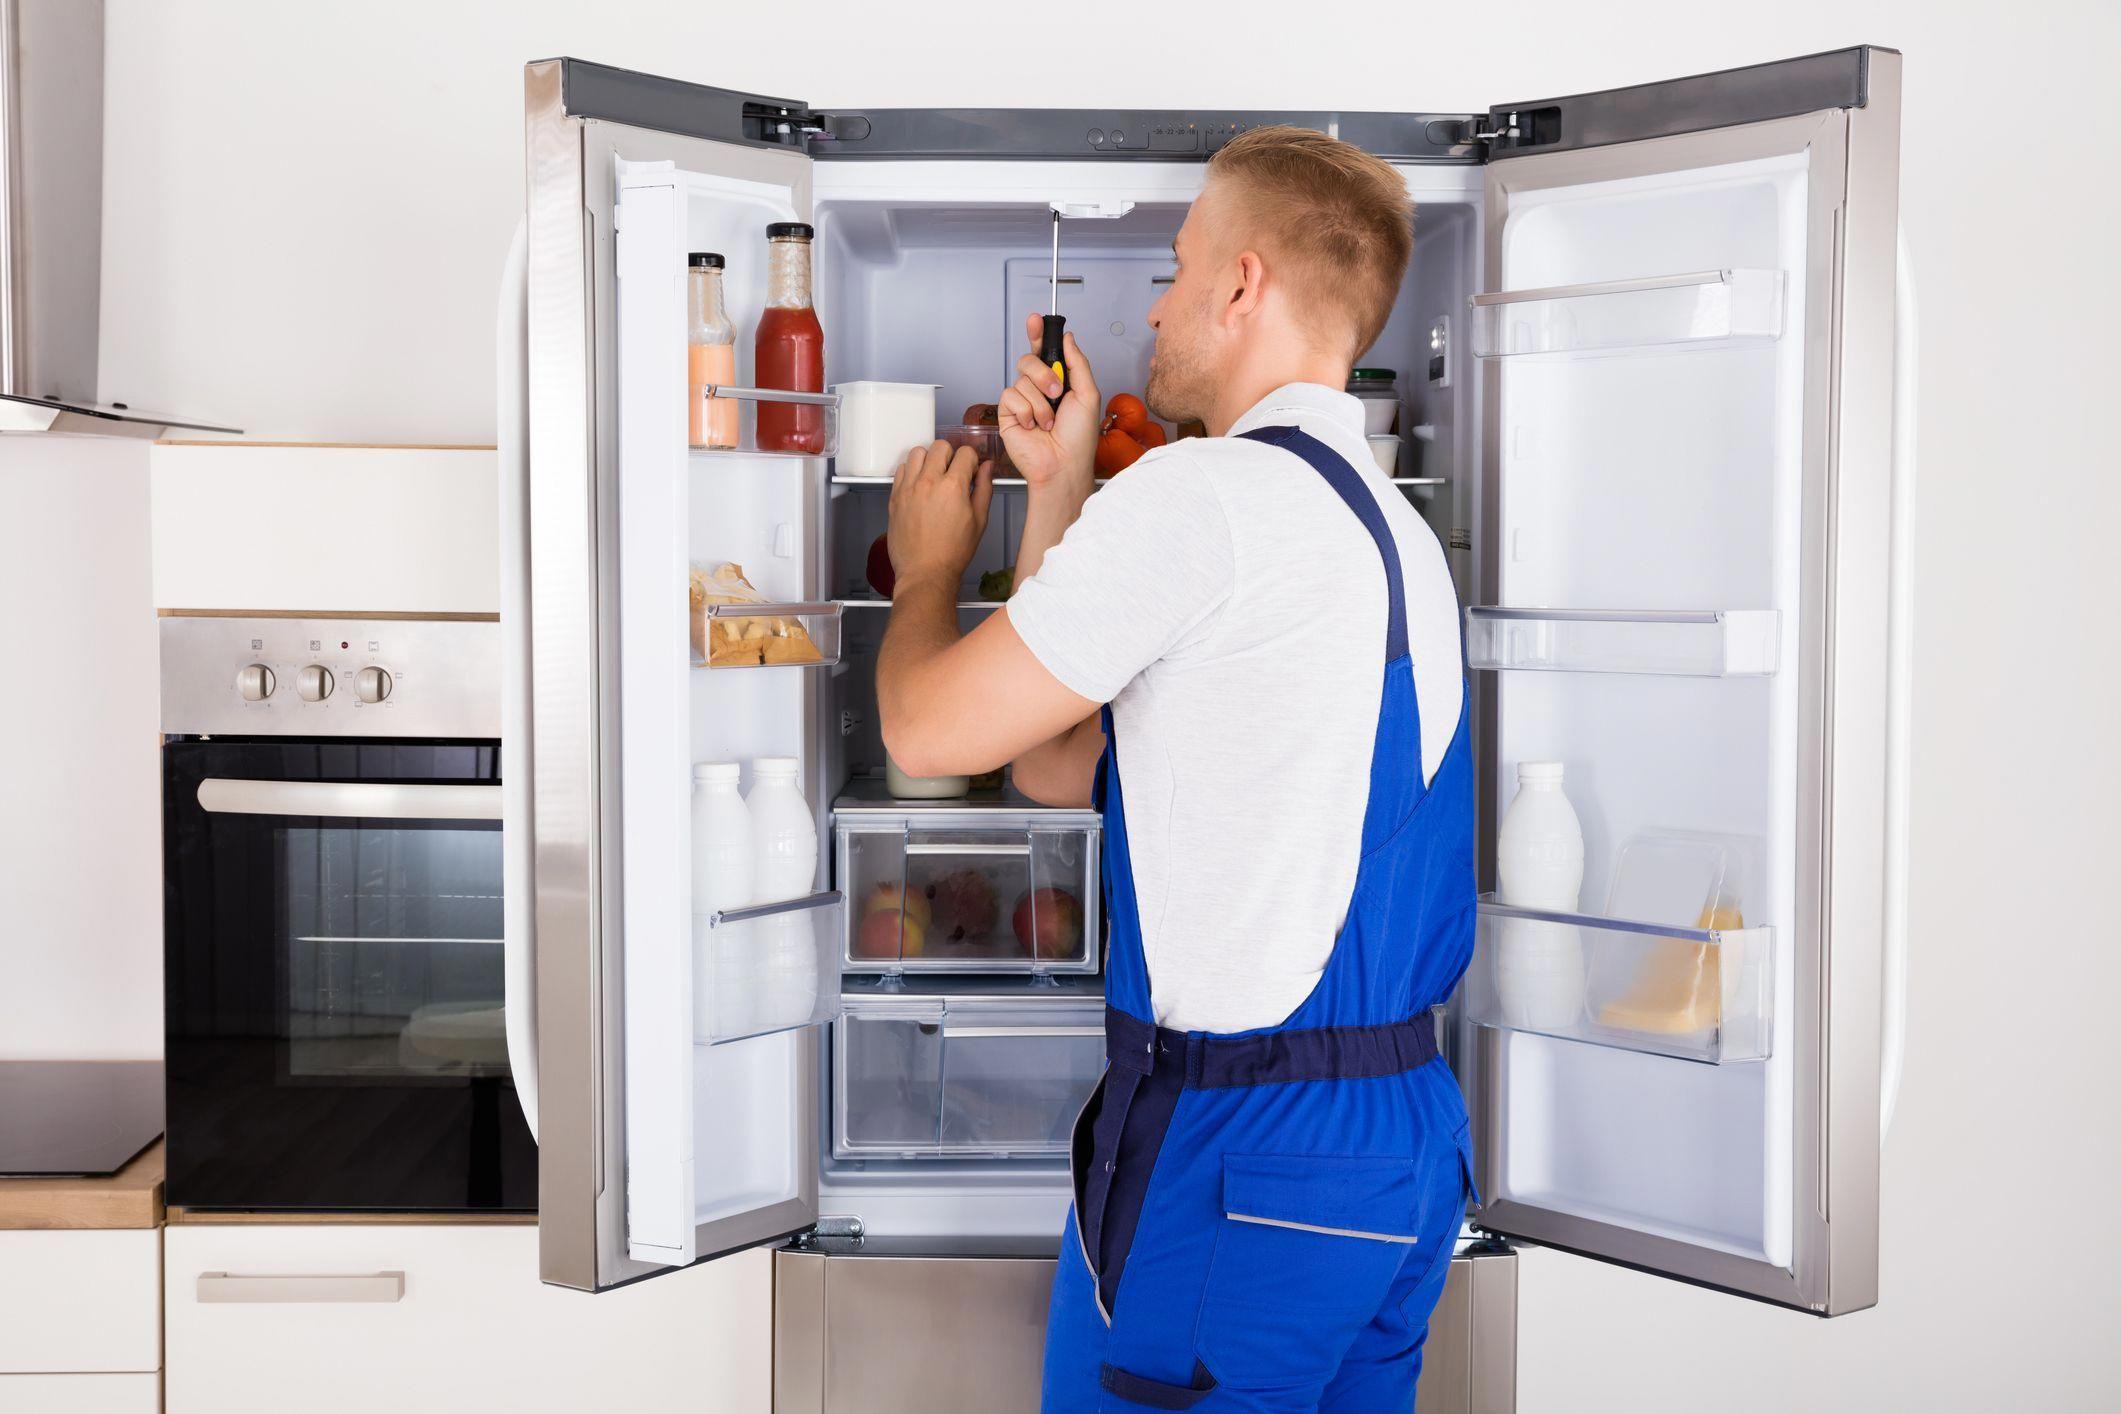 Home Appliances Online Store Insuranceforhomeappliances Whathomeappliancesproducecarbonmonoxide Refrigerator Repair Kitchen Appliances Refrigerator Service